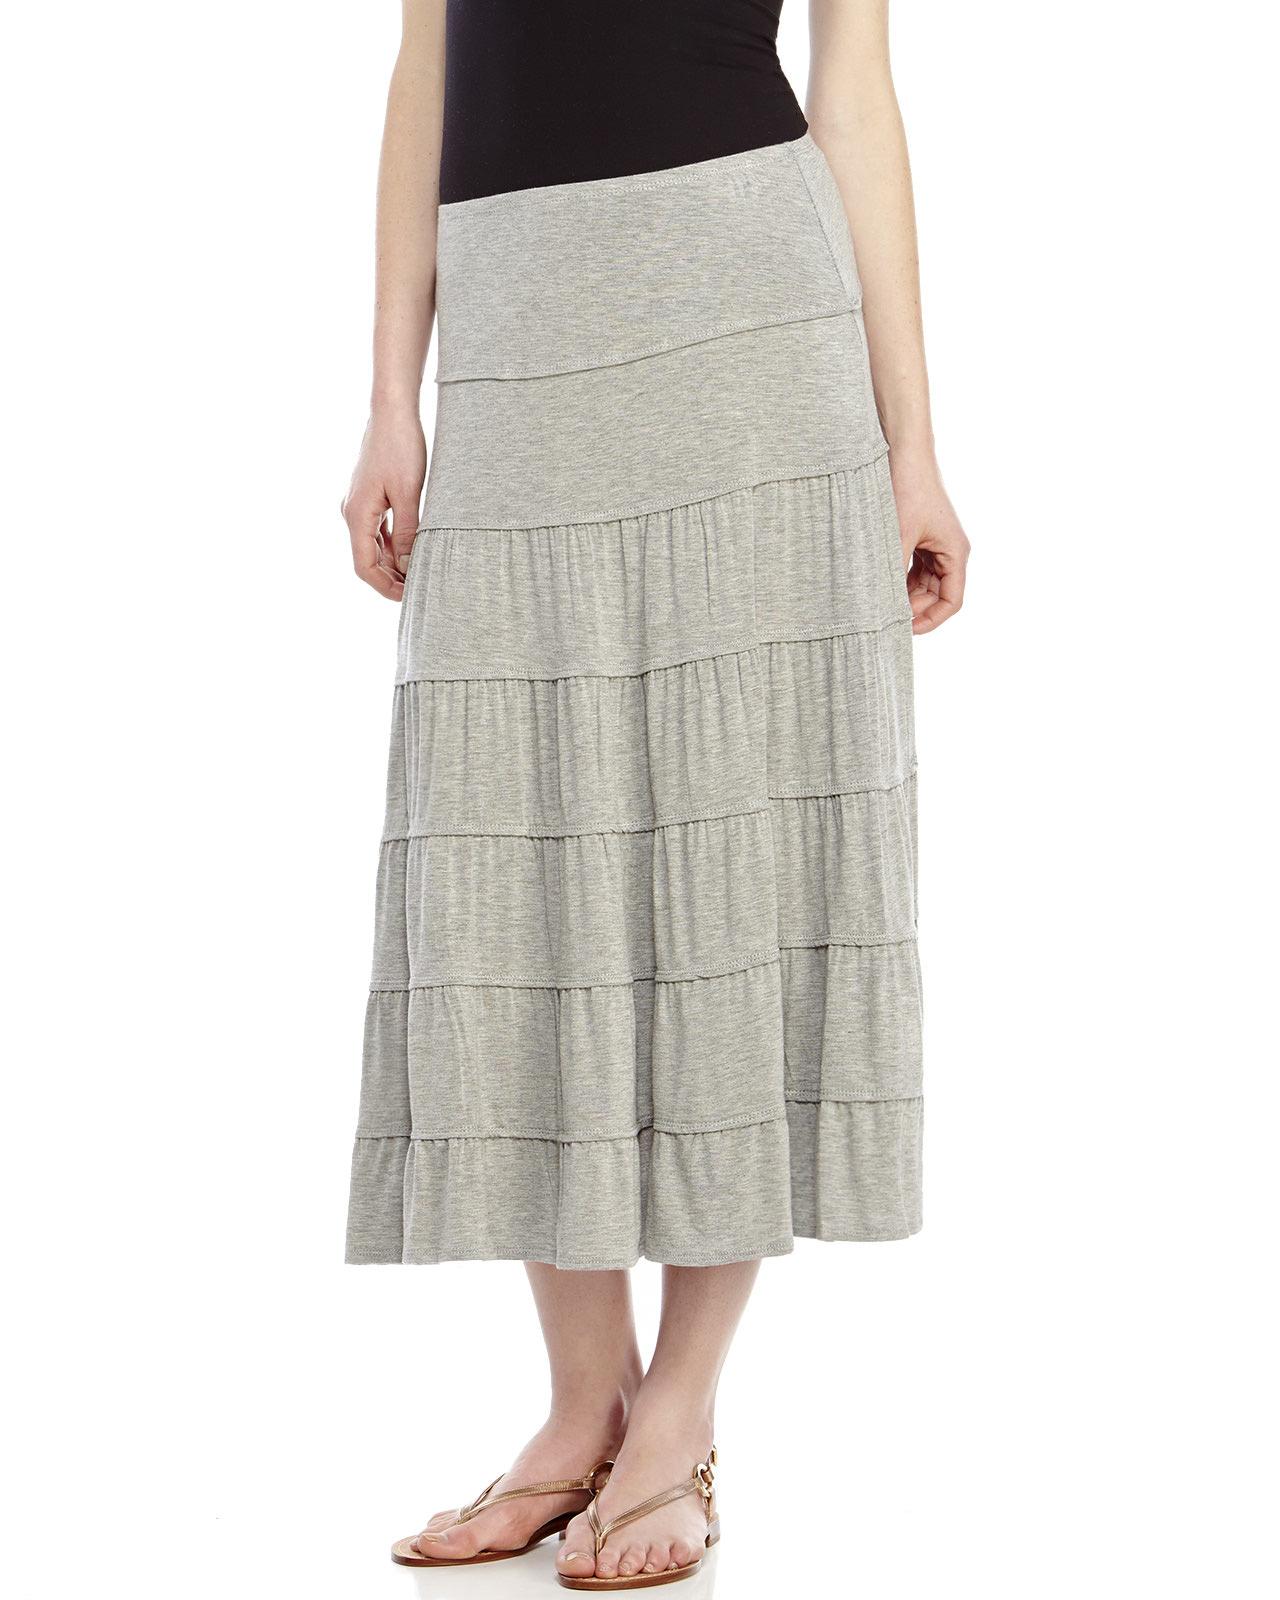 max studio light grey tiered midi skirt in gray